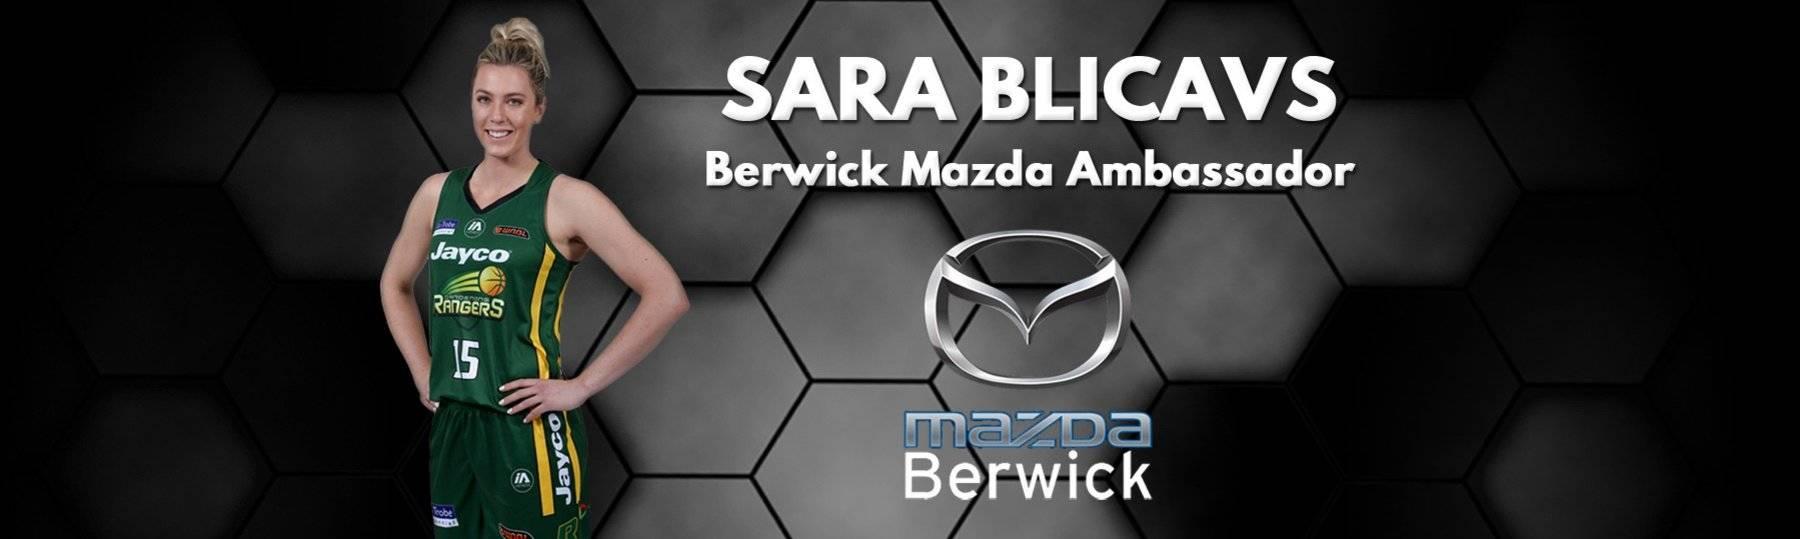 Sara Blicavs WNBL Jayco Rangers Berwick Mazda Ambassador